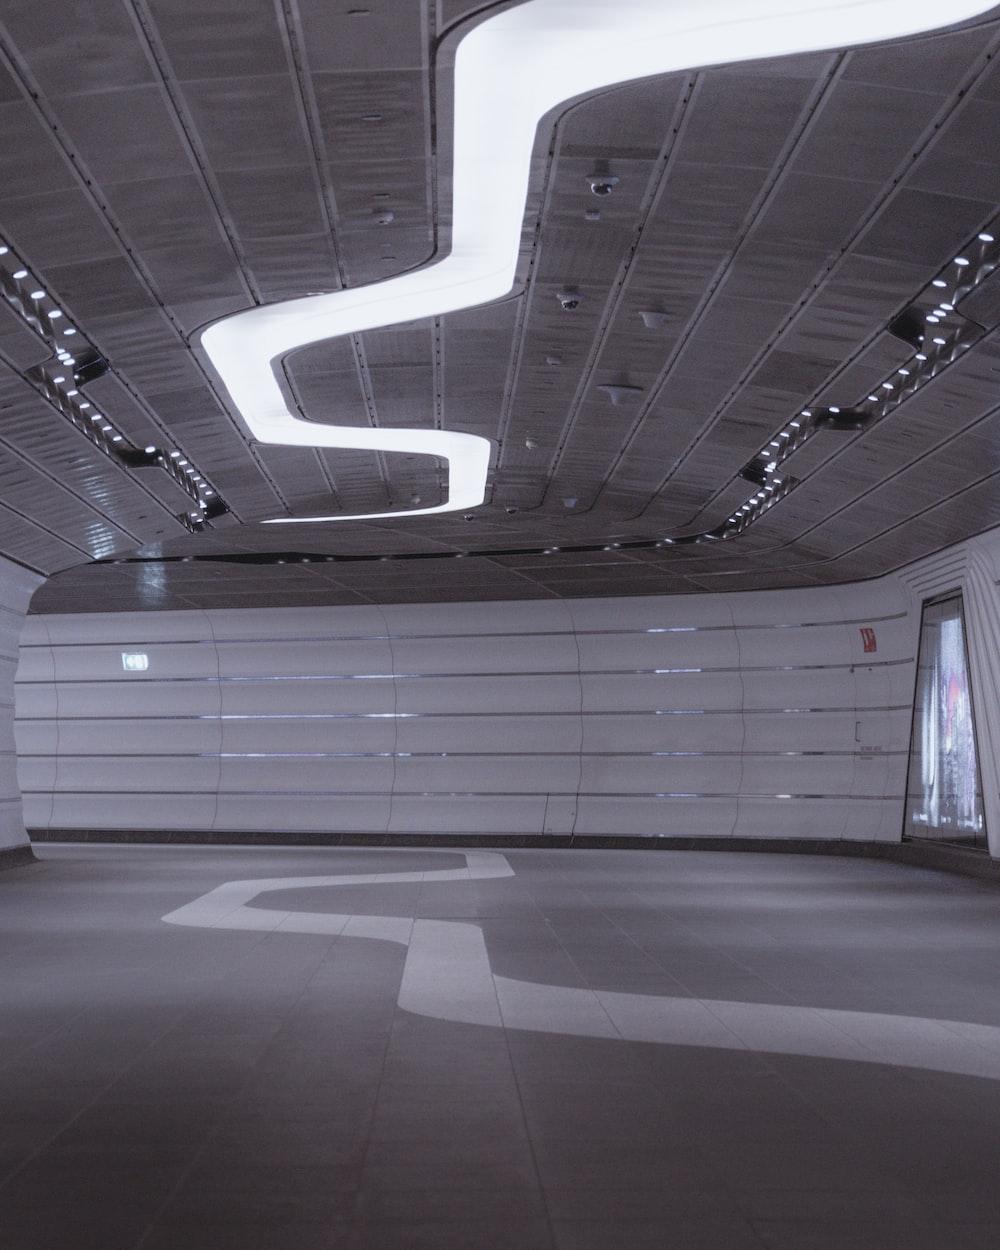 turned-on false ceiling light